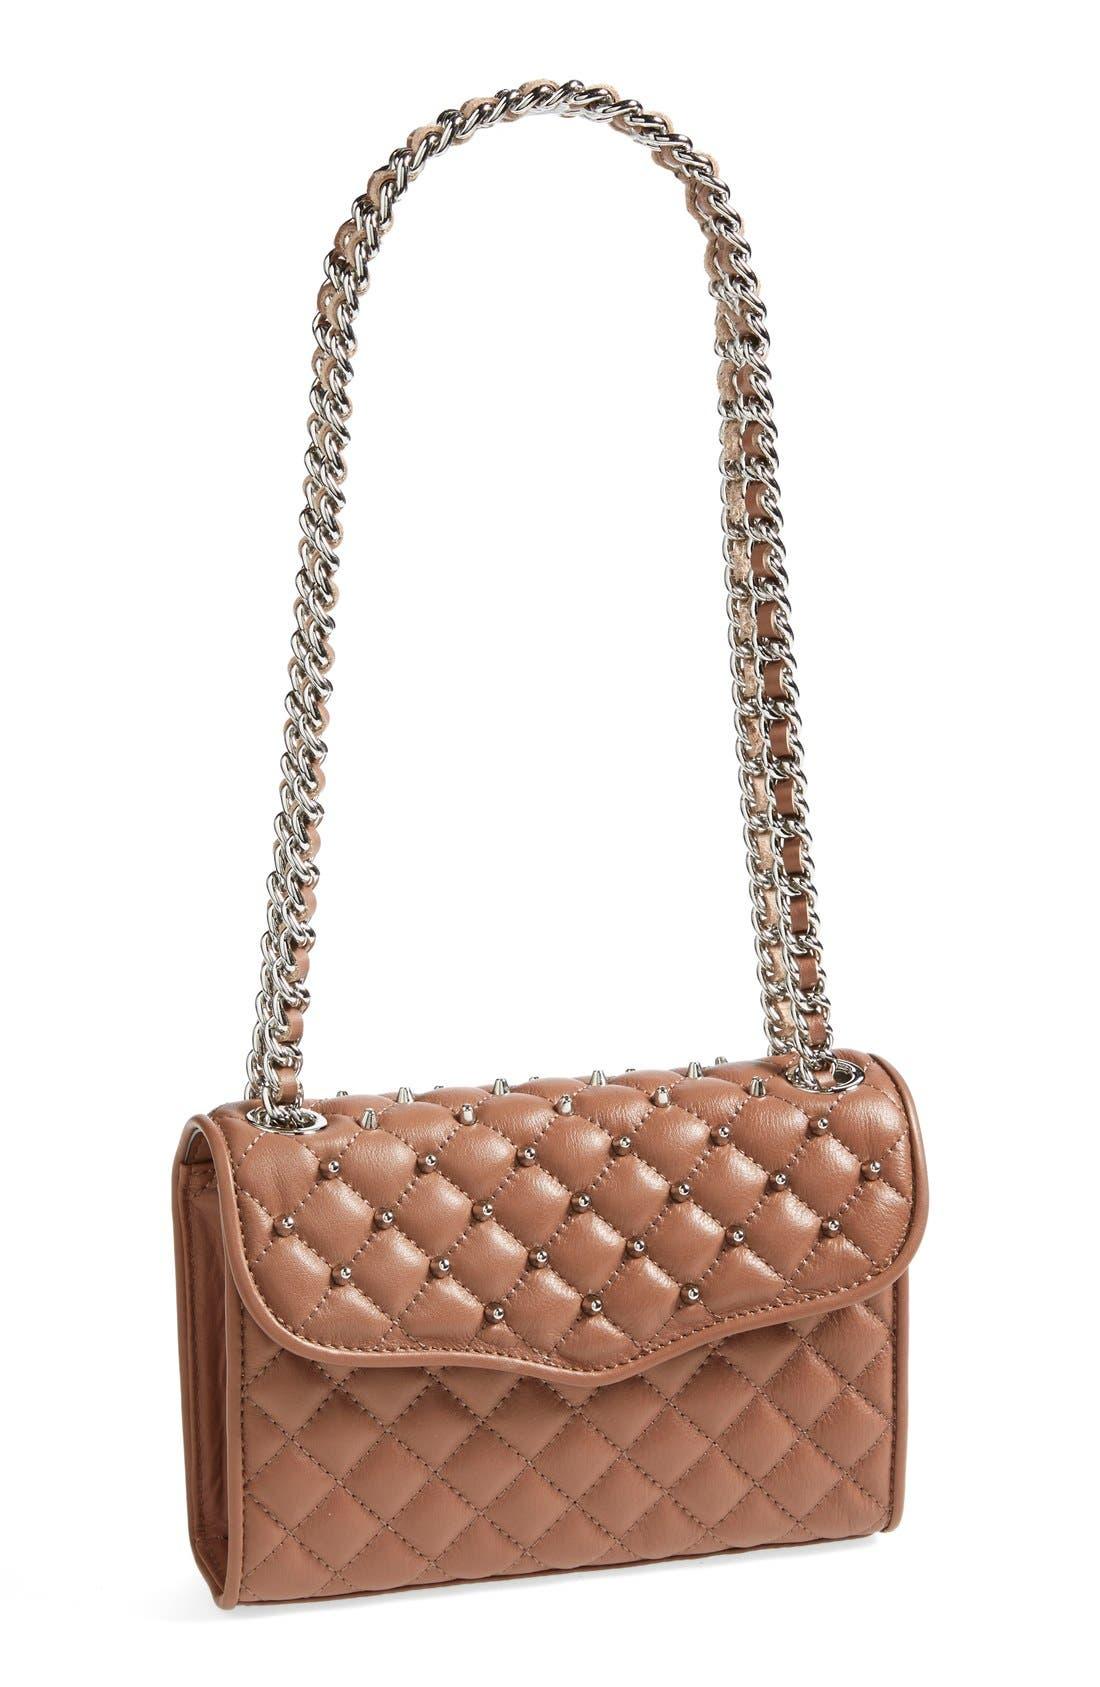 Alternate Image 1 Selected - Rebecca Minkoff 'Mini Affair with Studs' Convertible Crossbody Bag